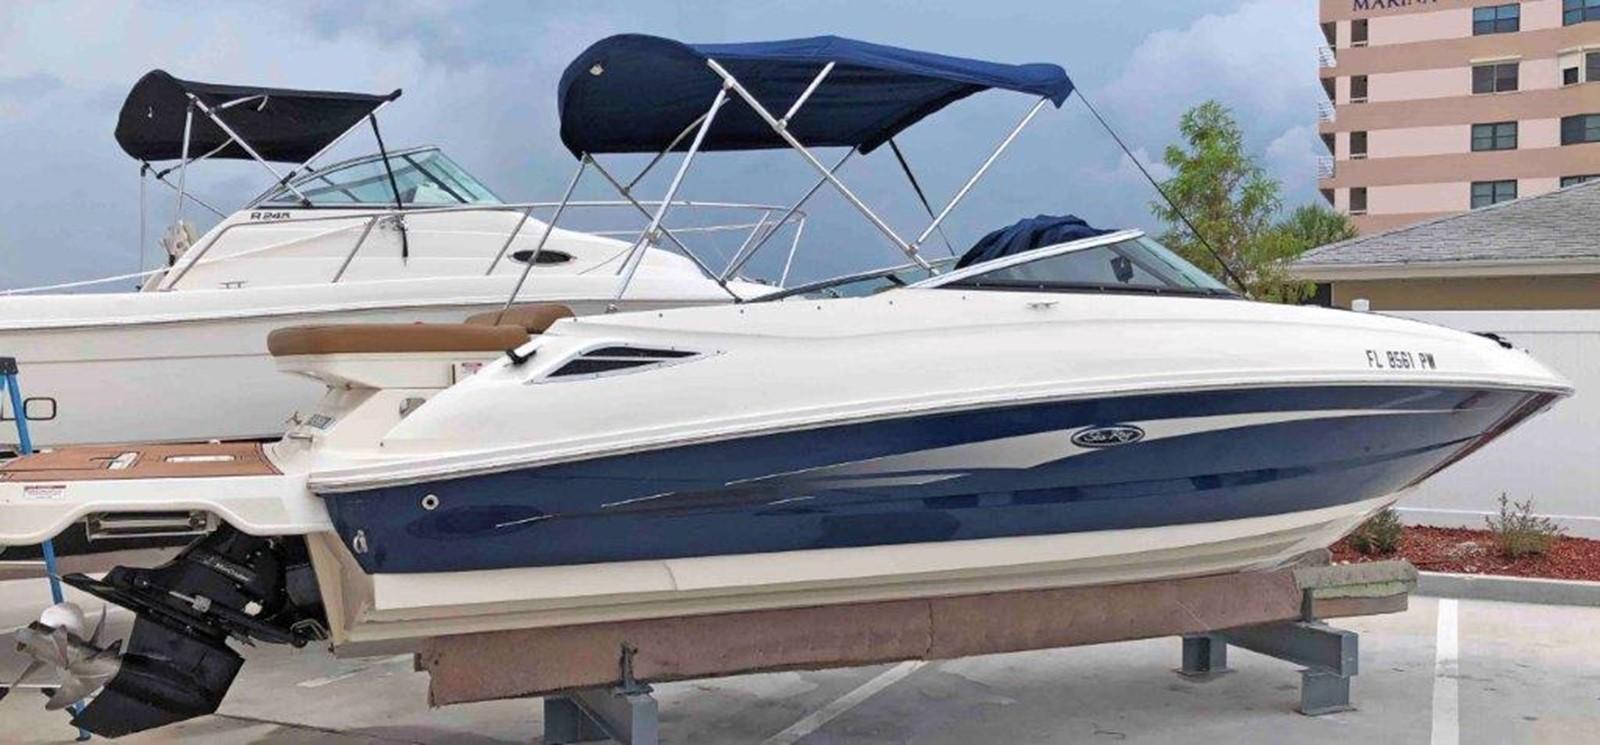 2015 SEA RAY 240 SunDeck Deck Boat 2674192